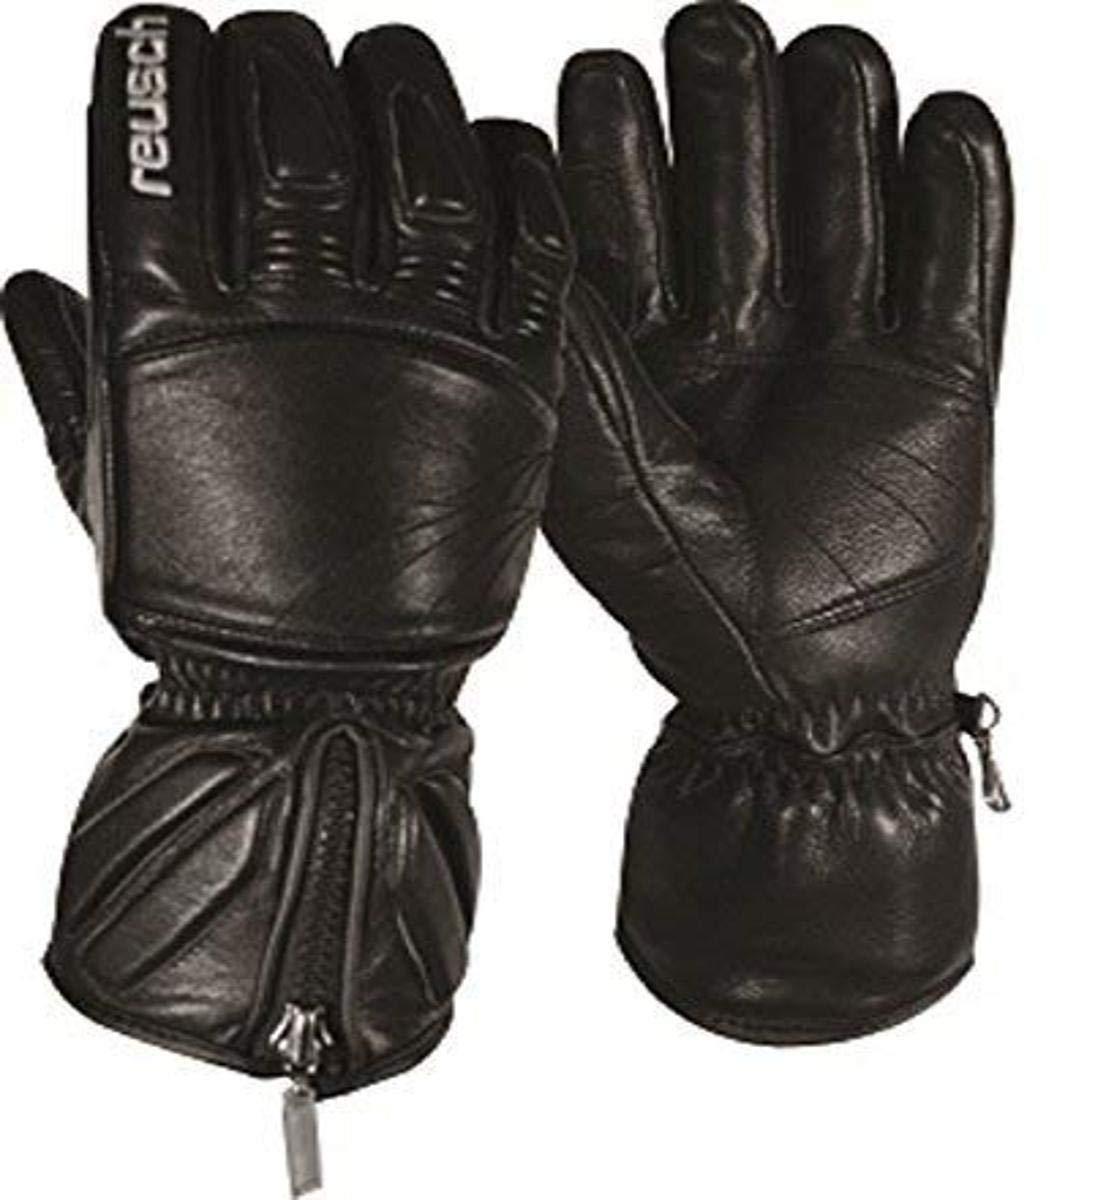 Reusch Snowsports Andor GTX Ski Gloves